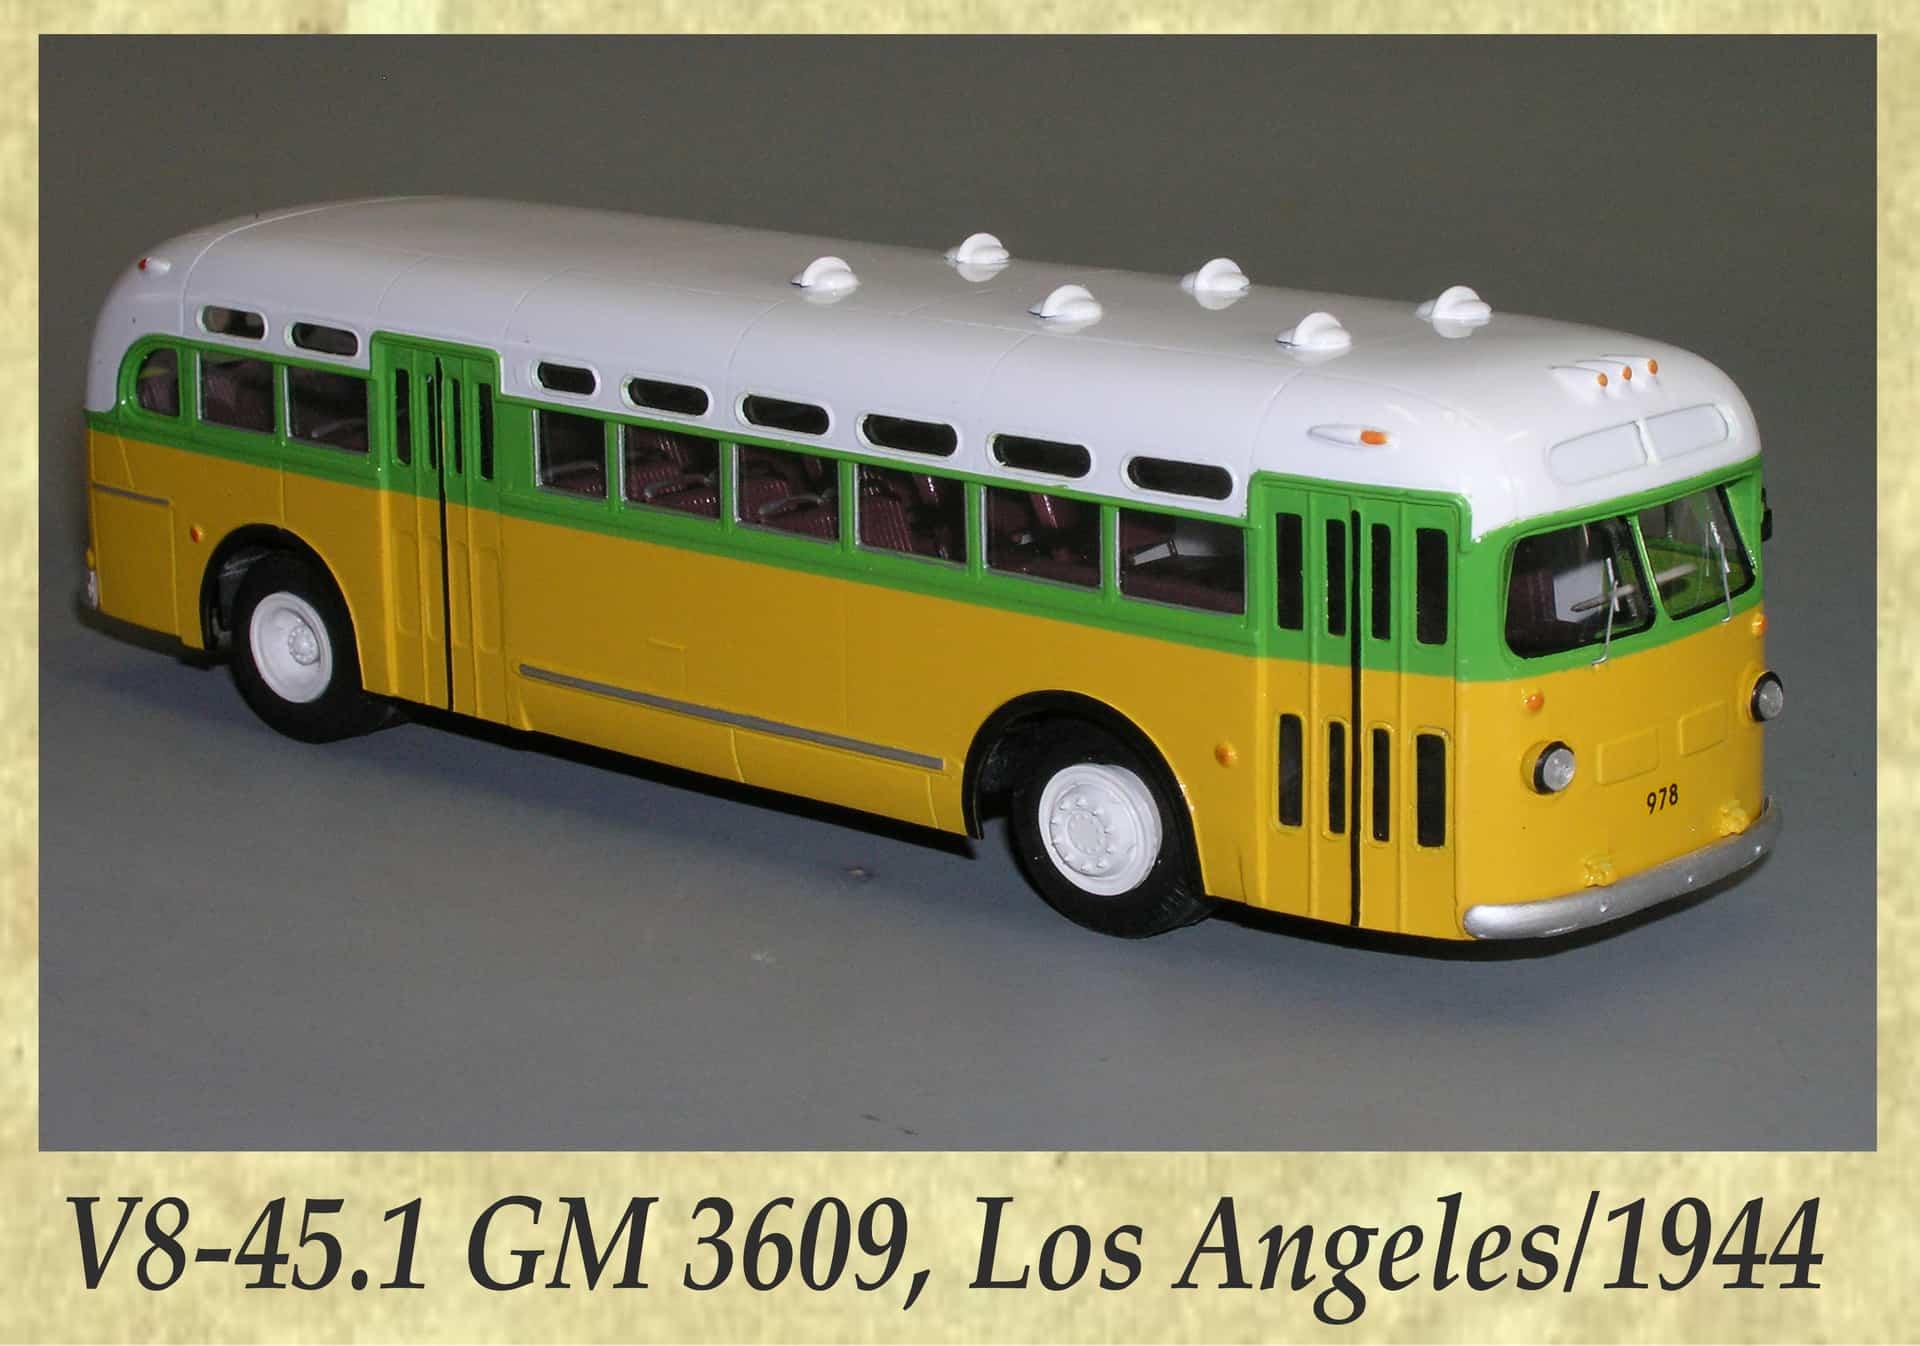 V8-45.1 GM 3609, Los Angeles 1944